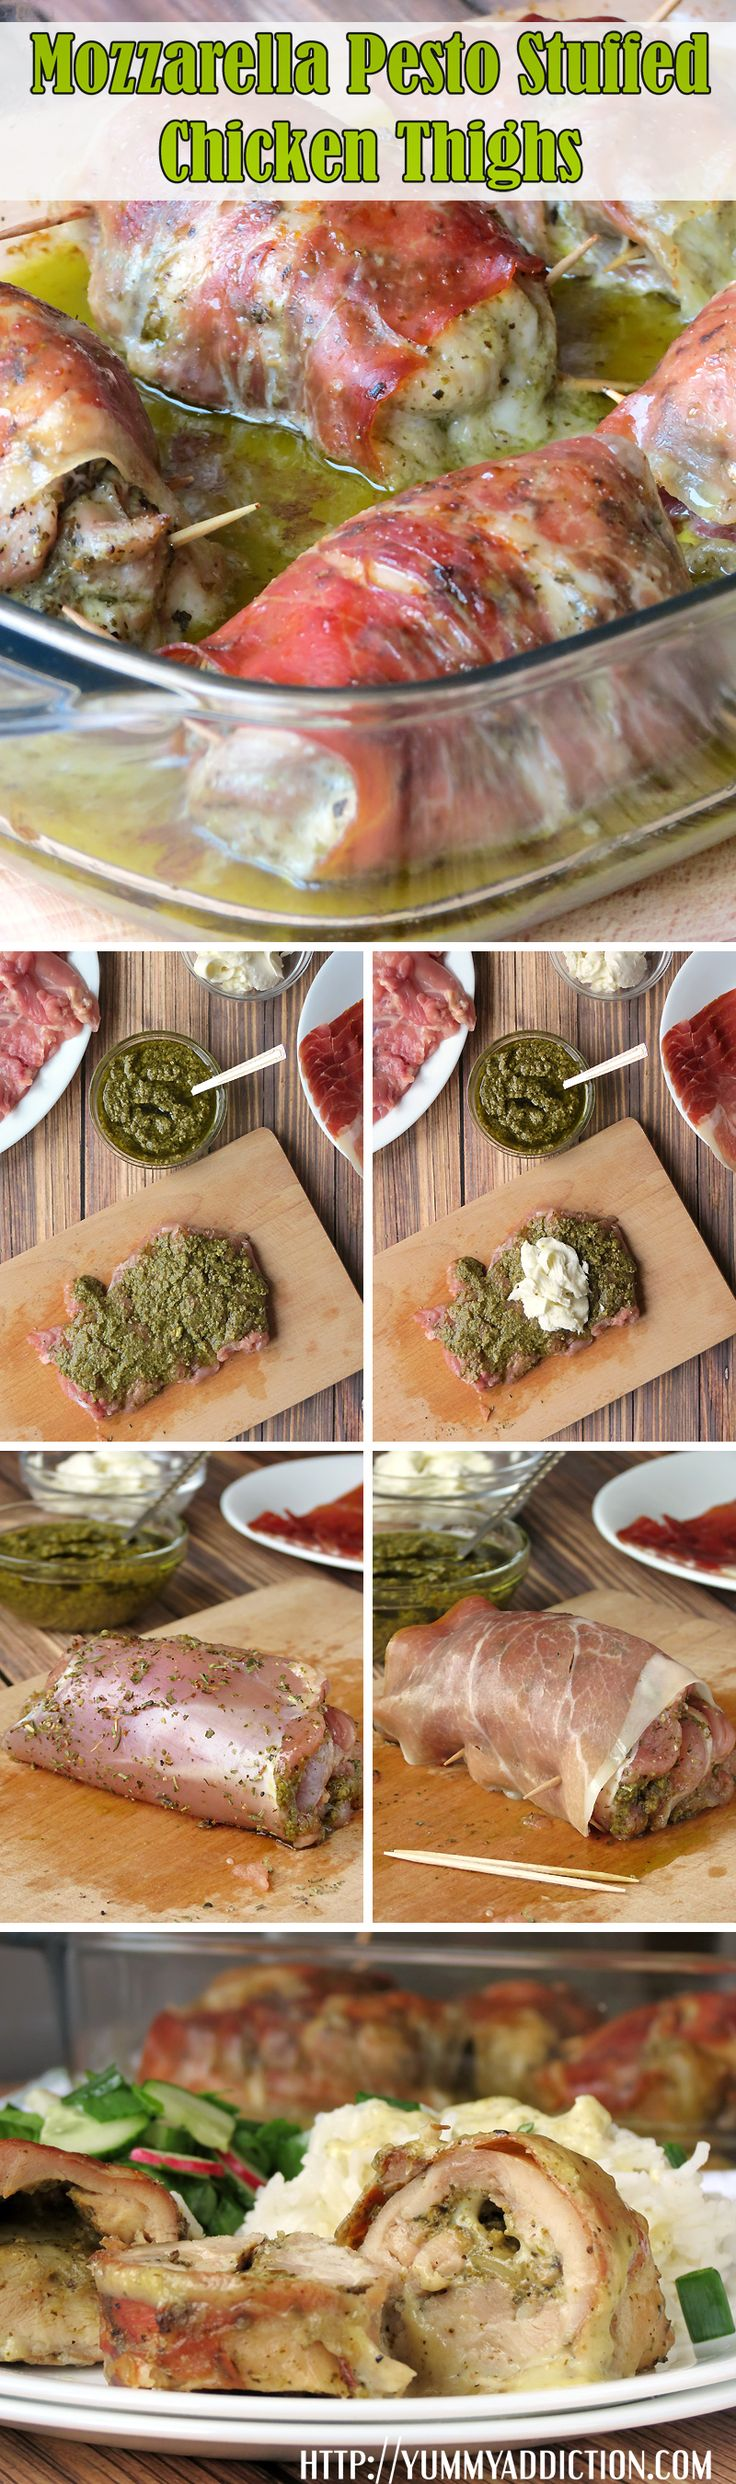 Prosciutto-Wrapped Mozzarella Pesto Stuffed Chicken Thighs | YummyAddiction.com